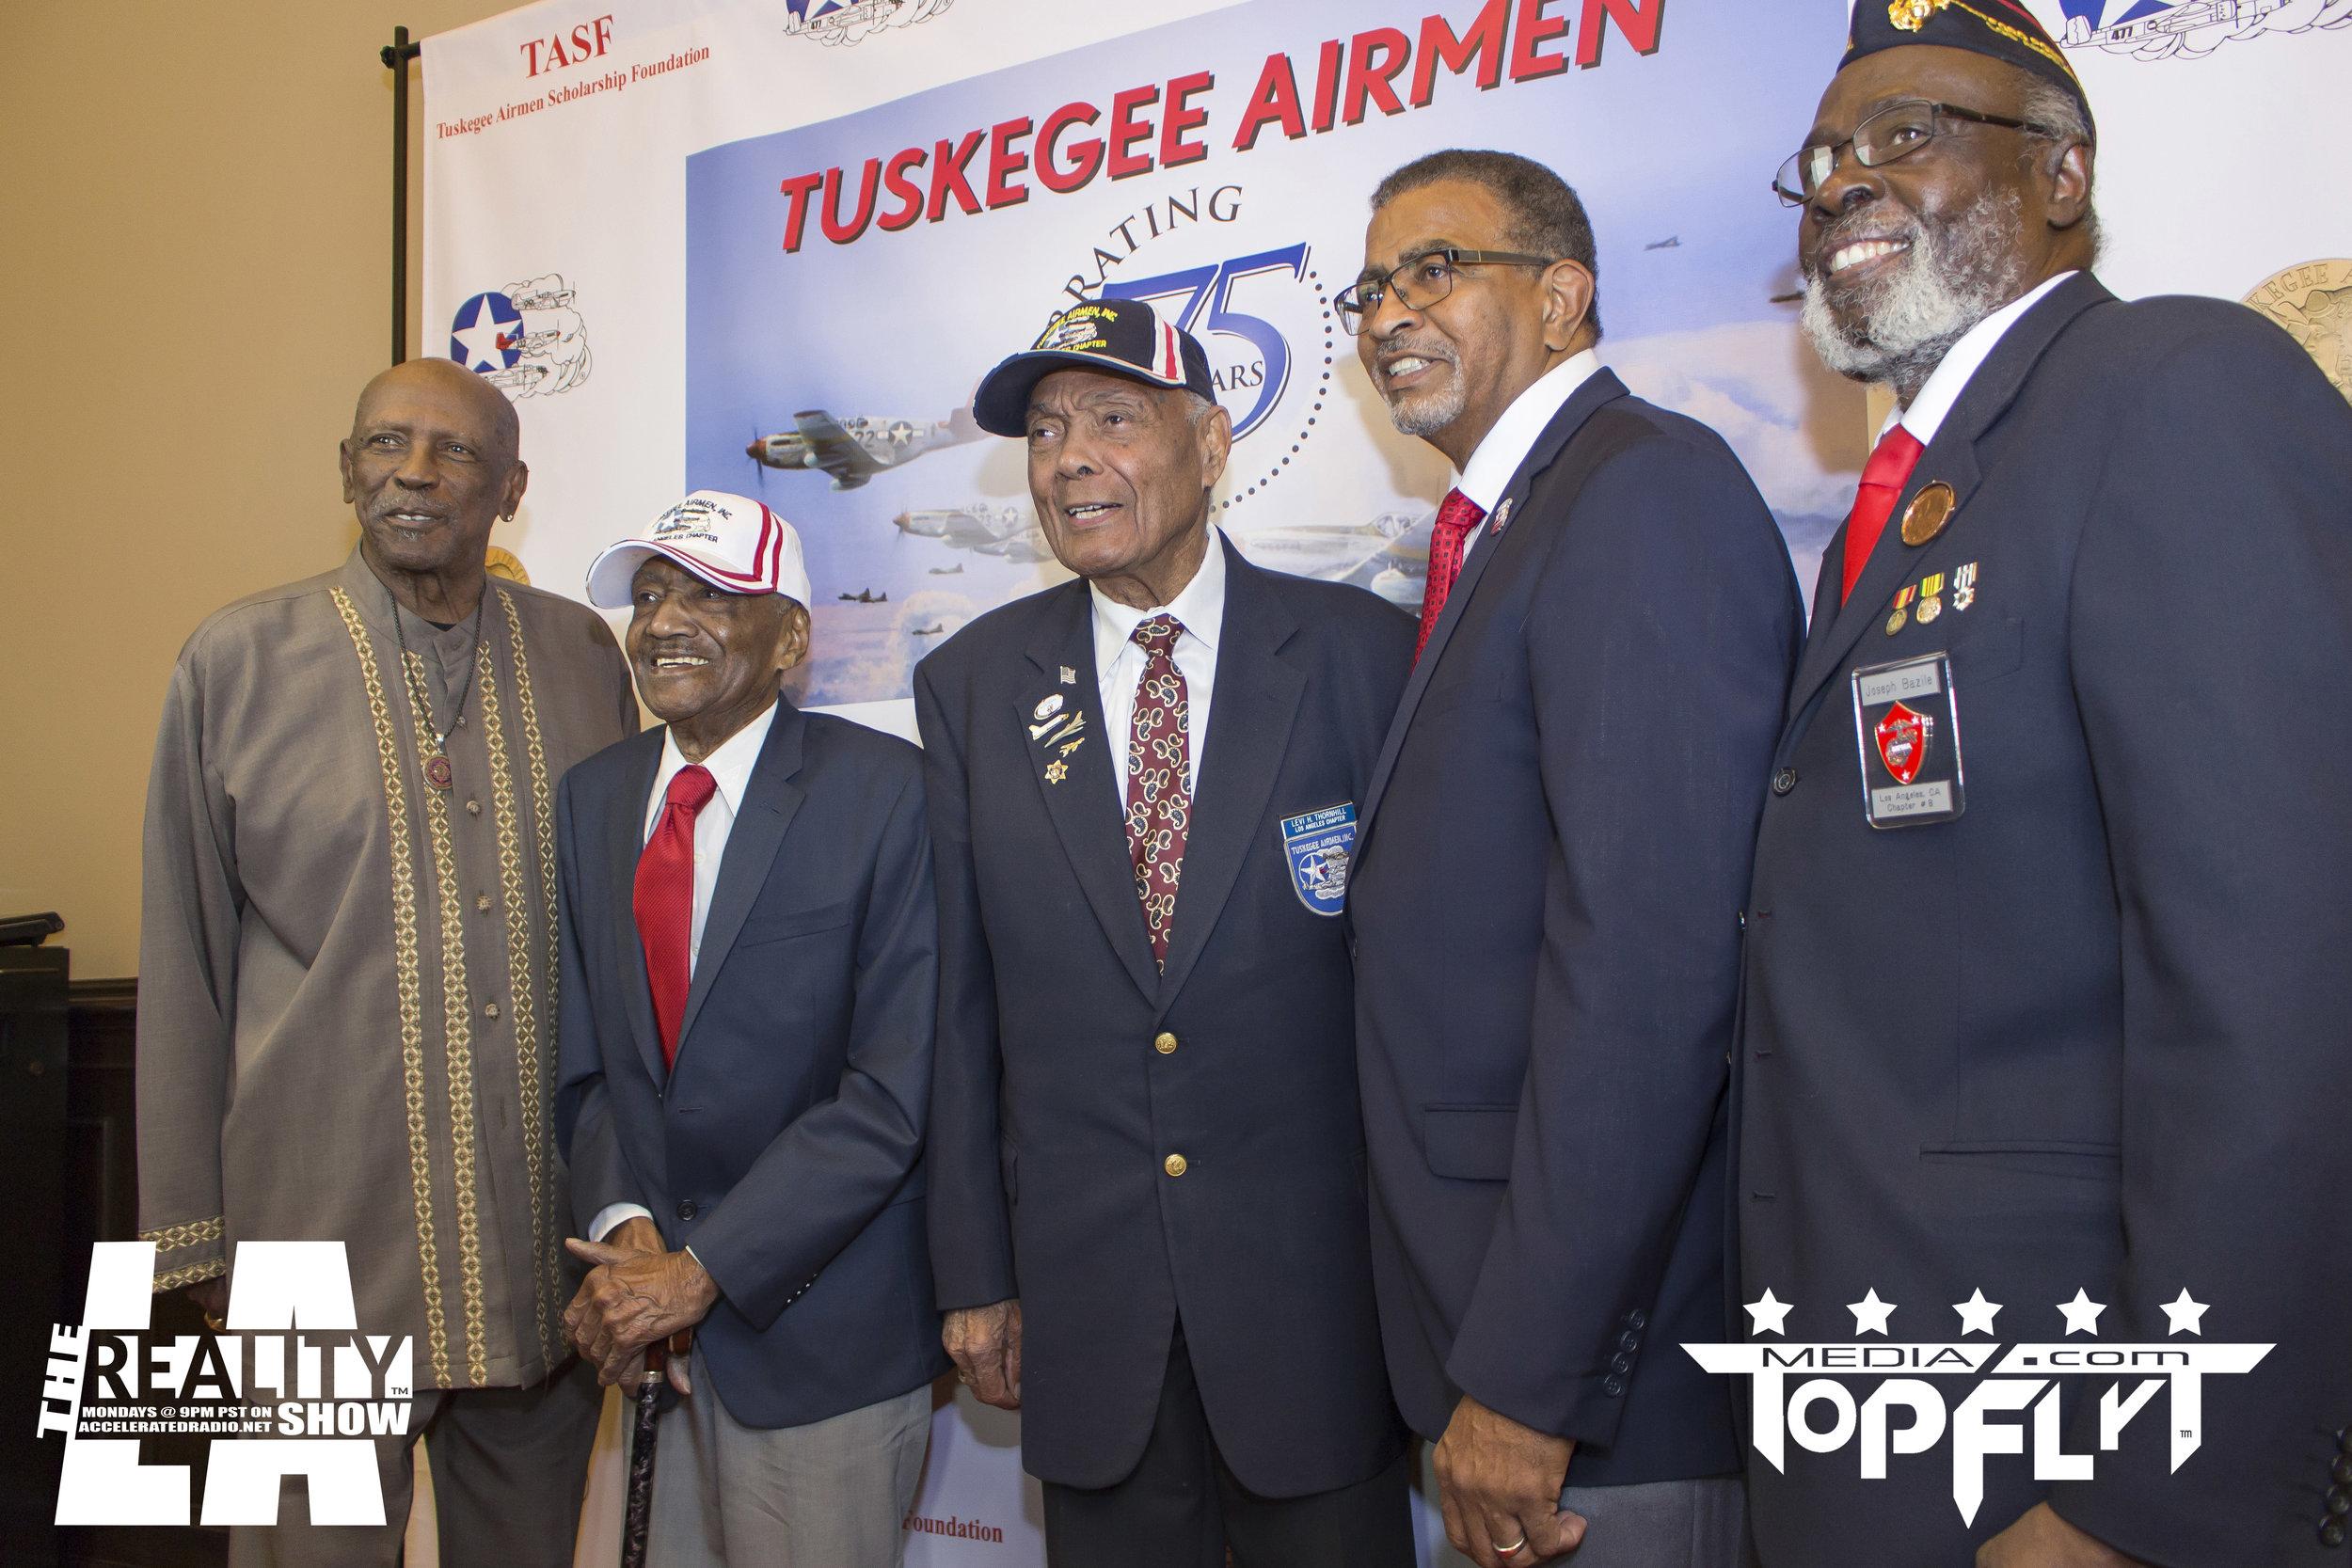 The Reality Show LA - Tuskegee Airmen 75th Anniversary VIP Reception_25.jpg